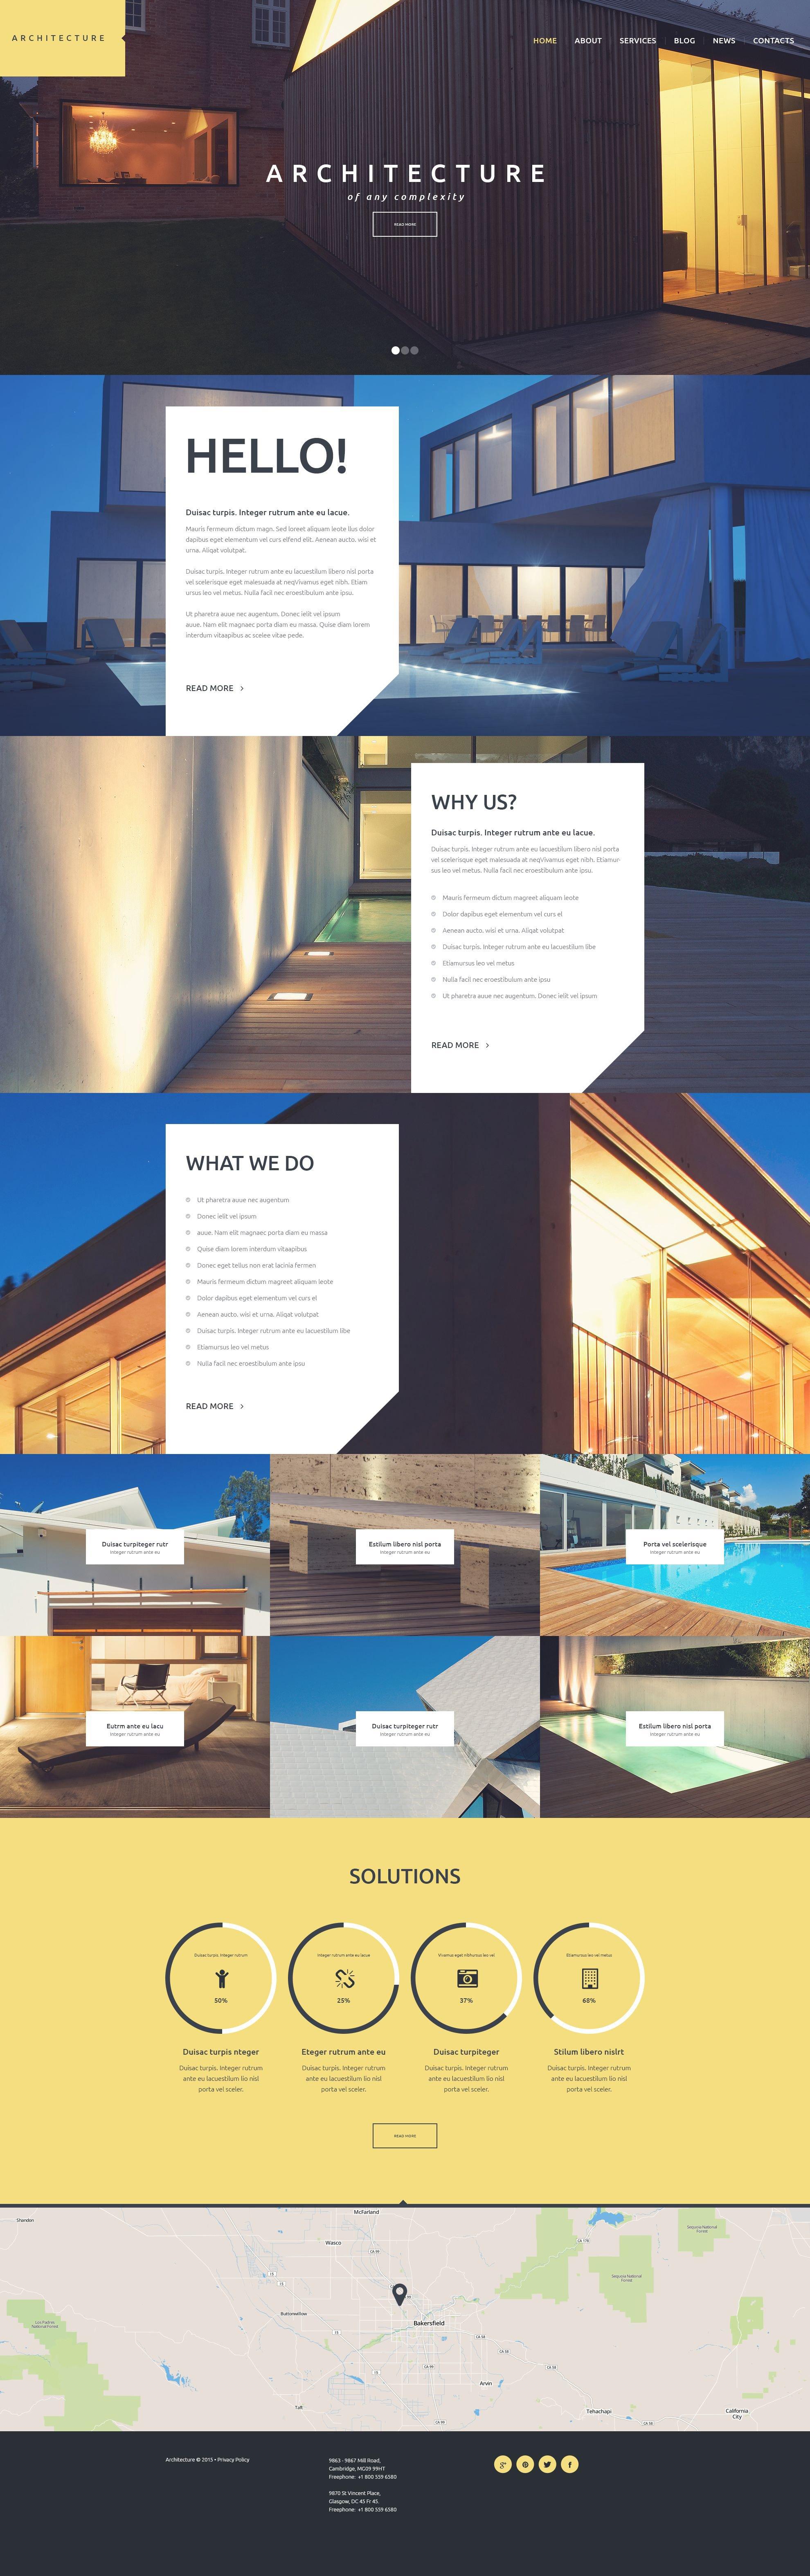 Architecture Business WordPress Theme - screenshot